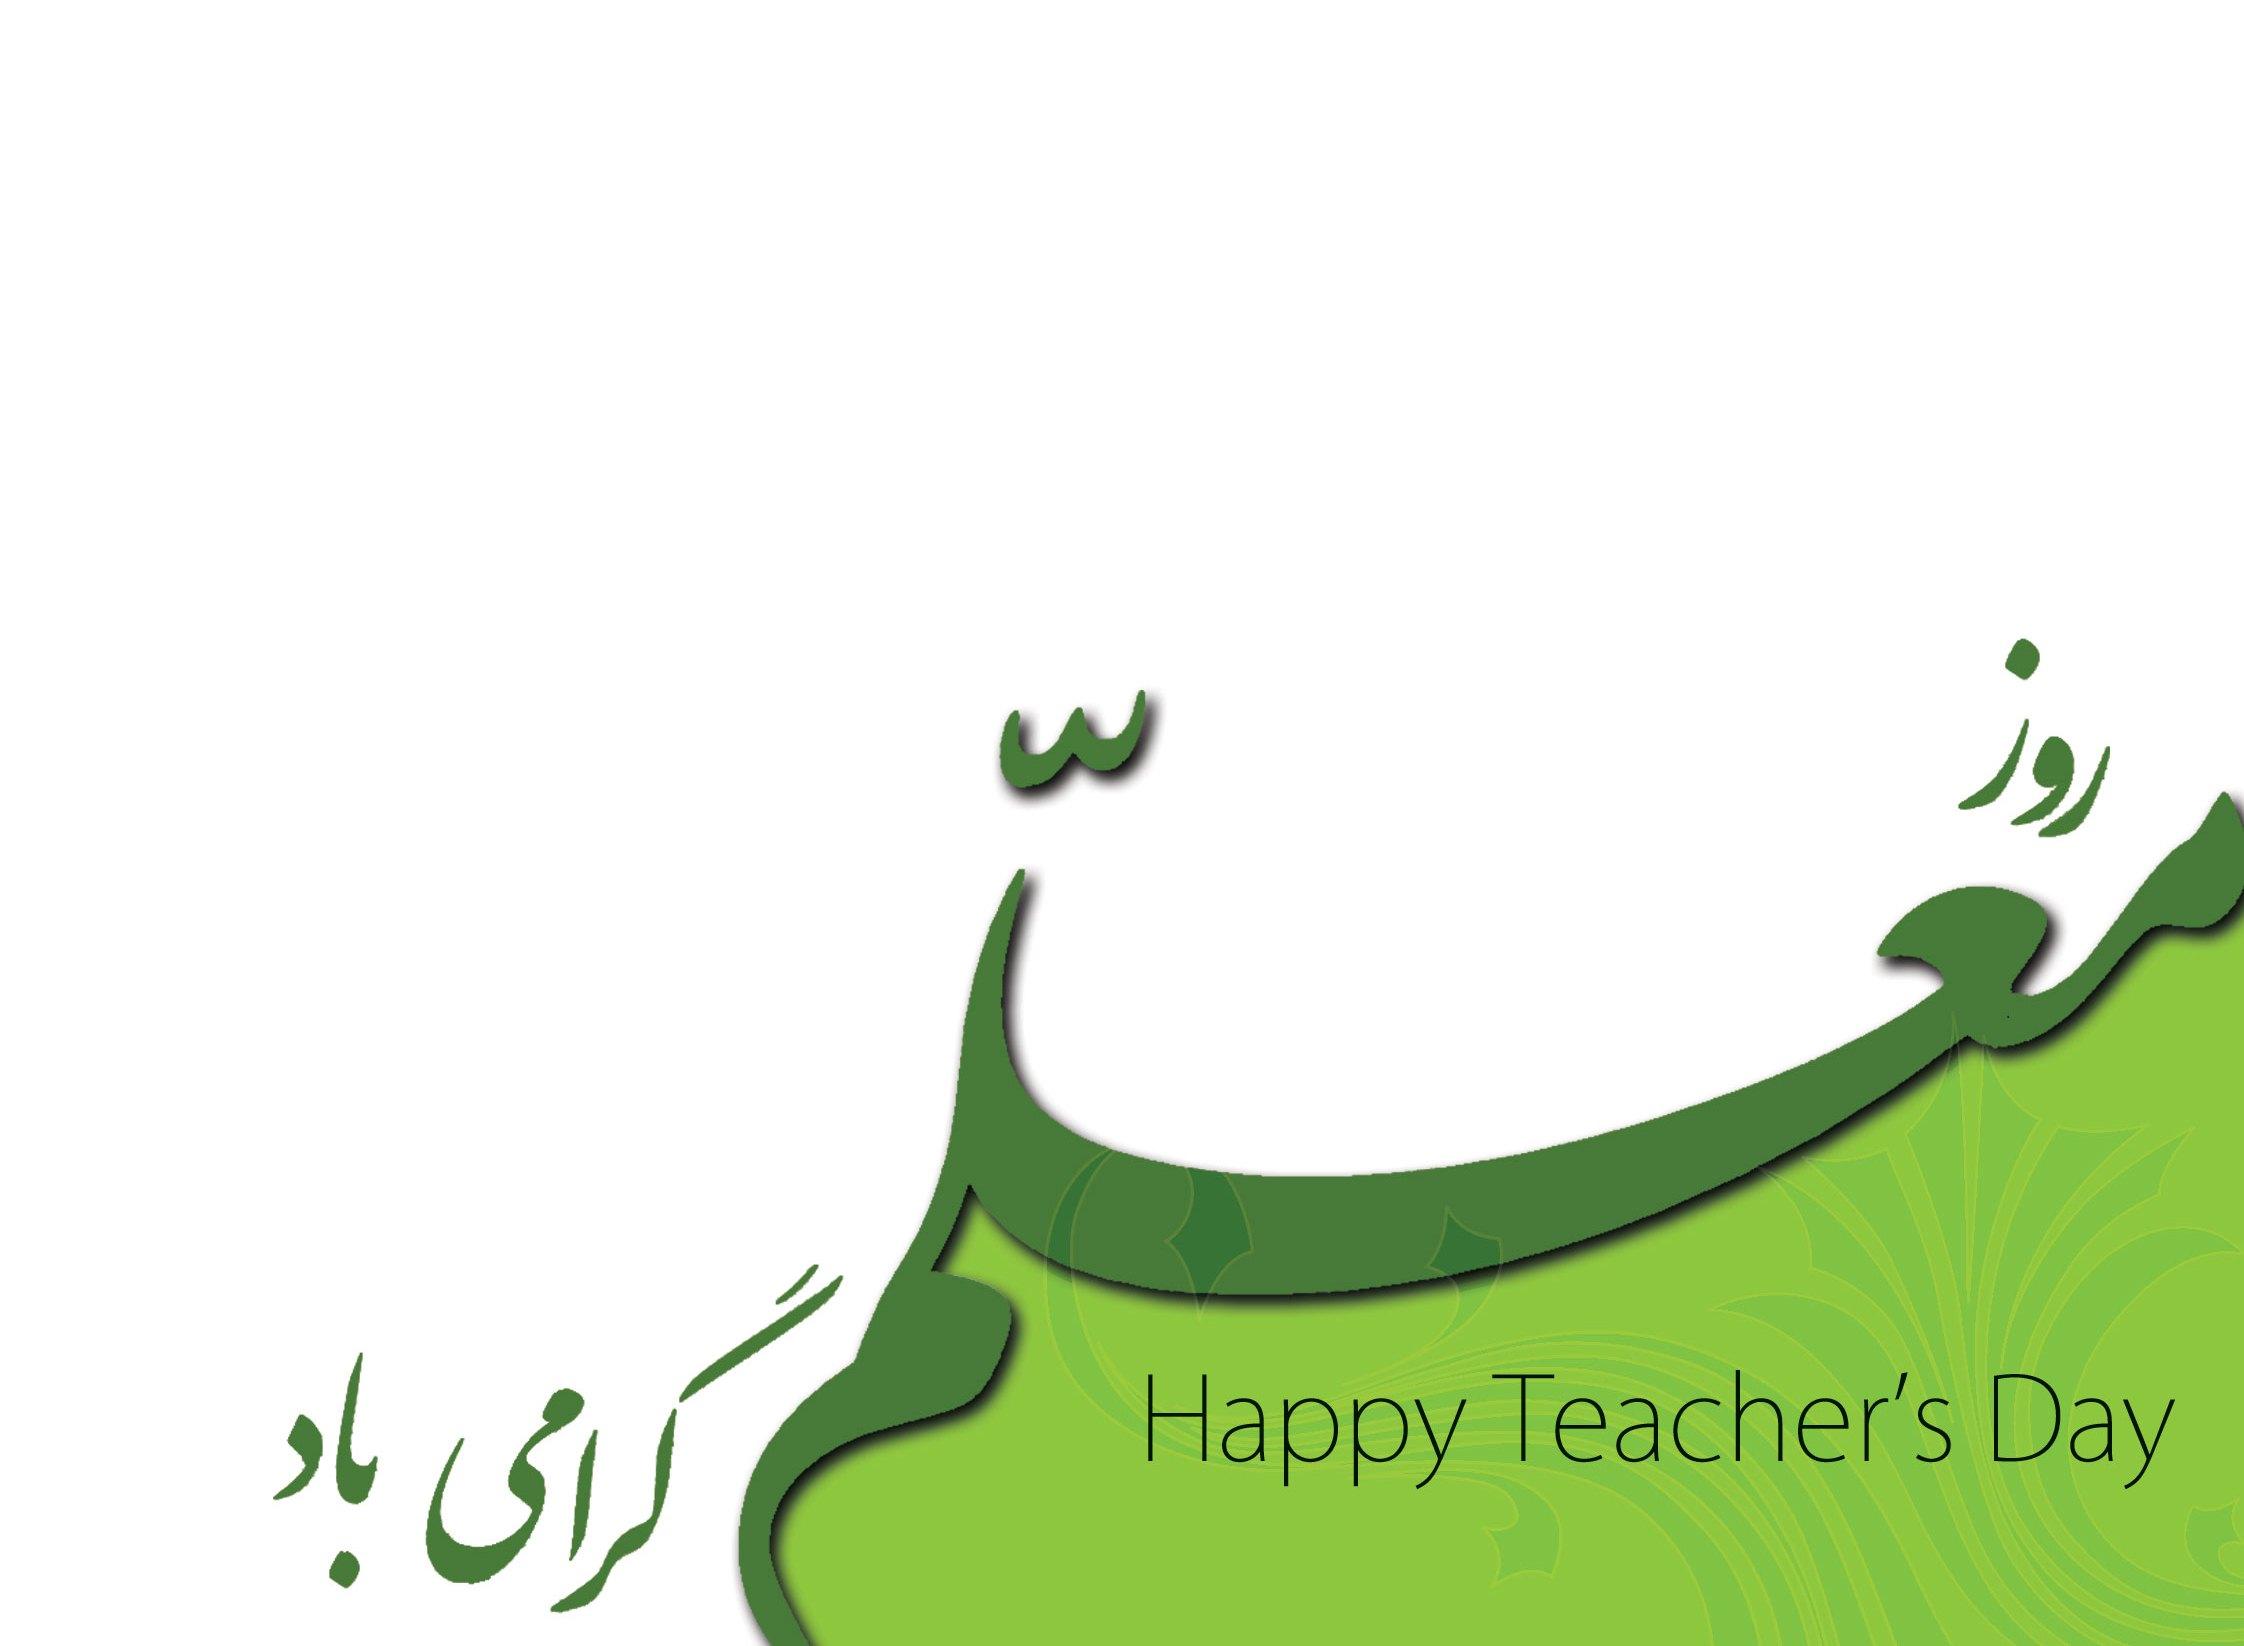 Photo of عکس متحرک برای روز معلم + جملات قدردانی و تشکر از معلم عزیز